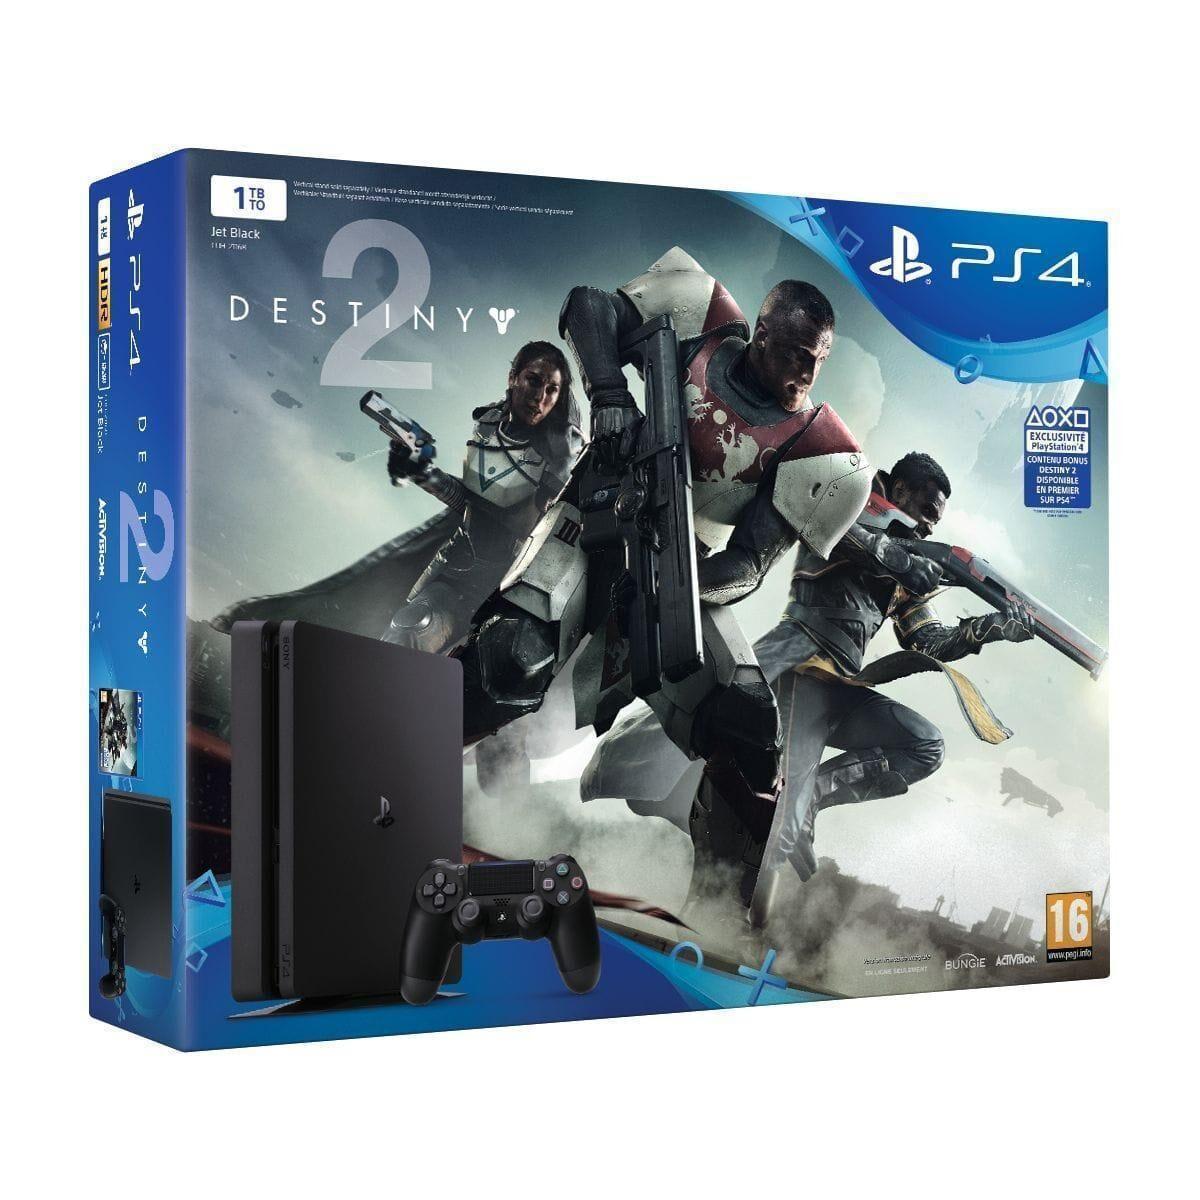 Refurbished-Very good-PlayStation 4 Slim  HDD 1 TB Black